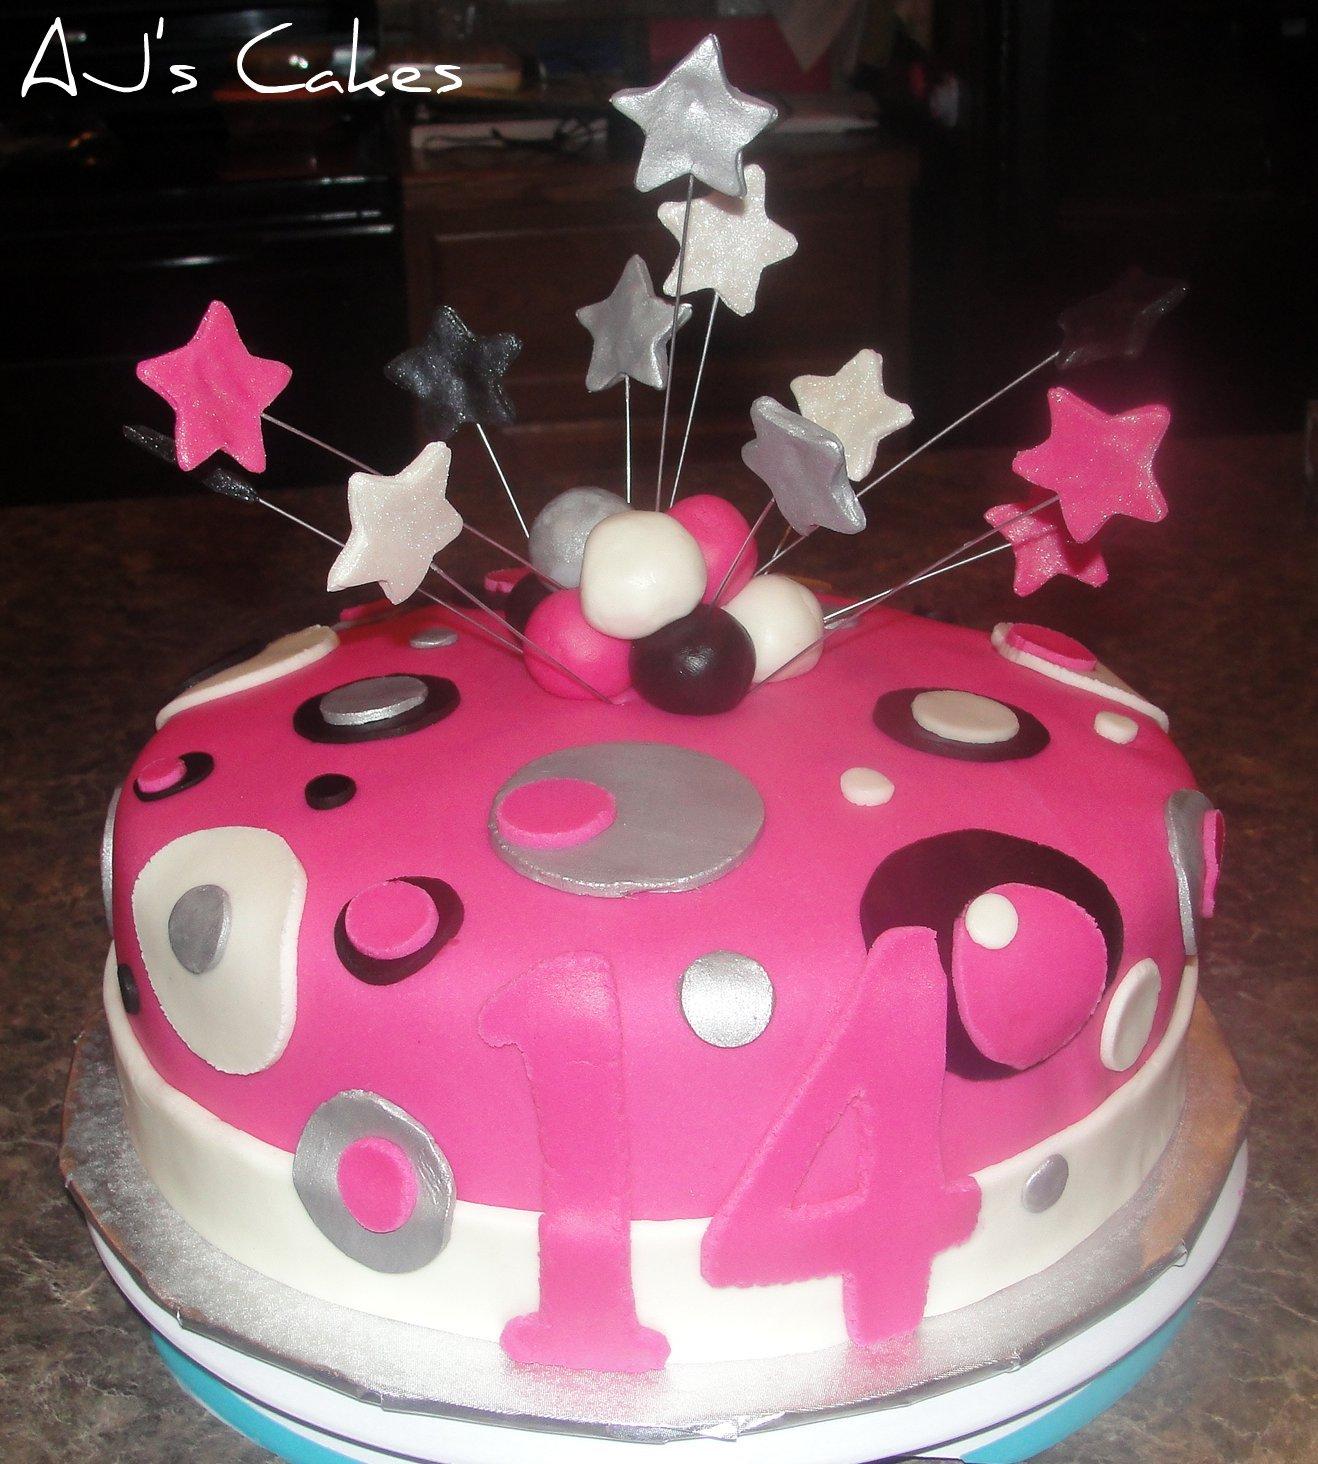 AJ's Cakes: Katie's Birthday Cake